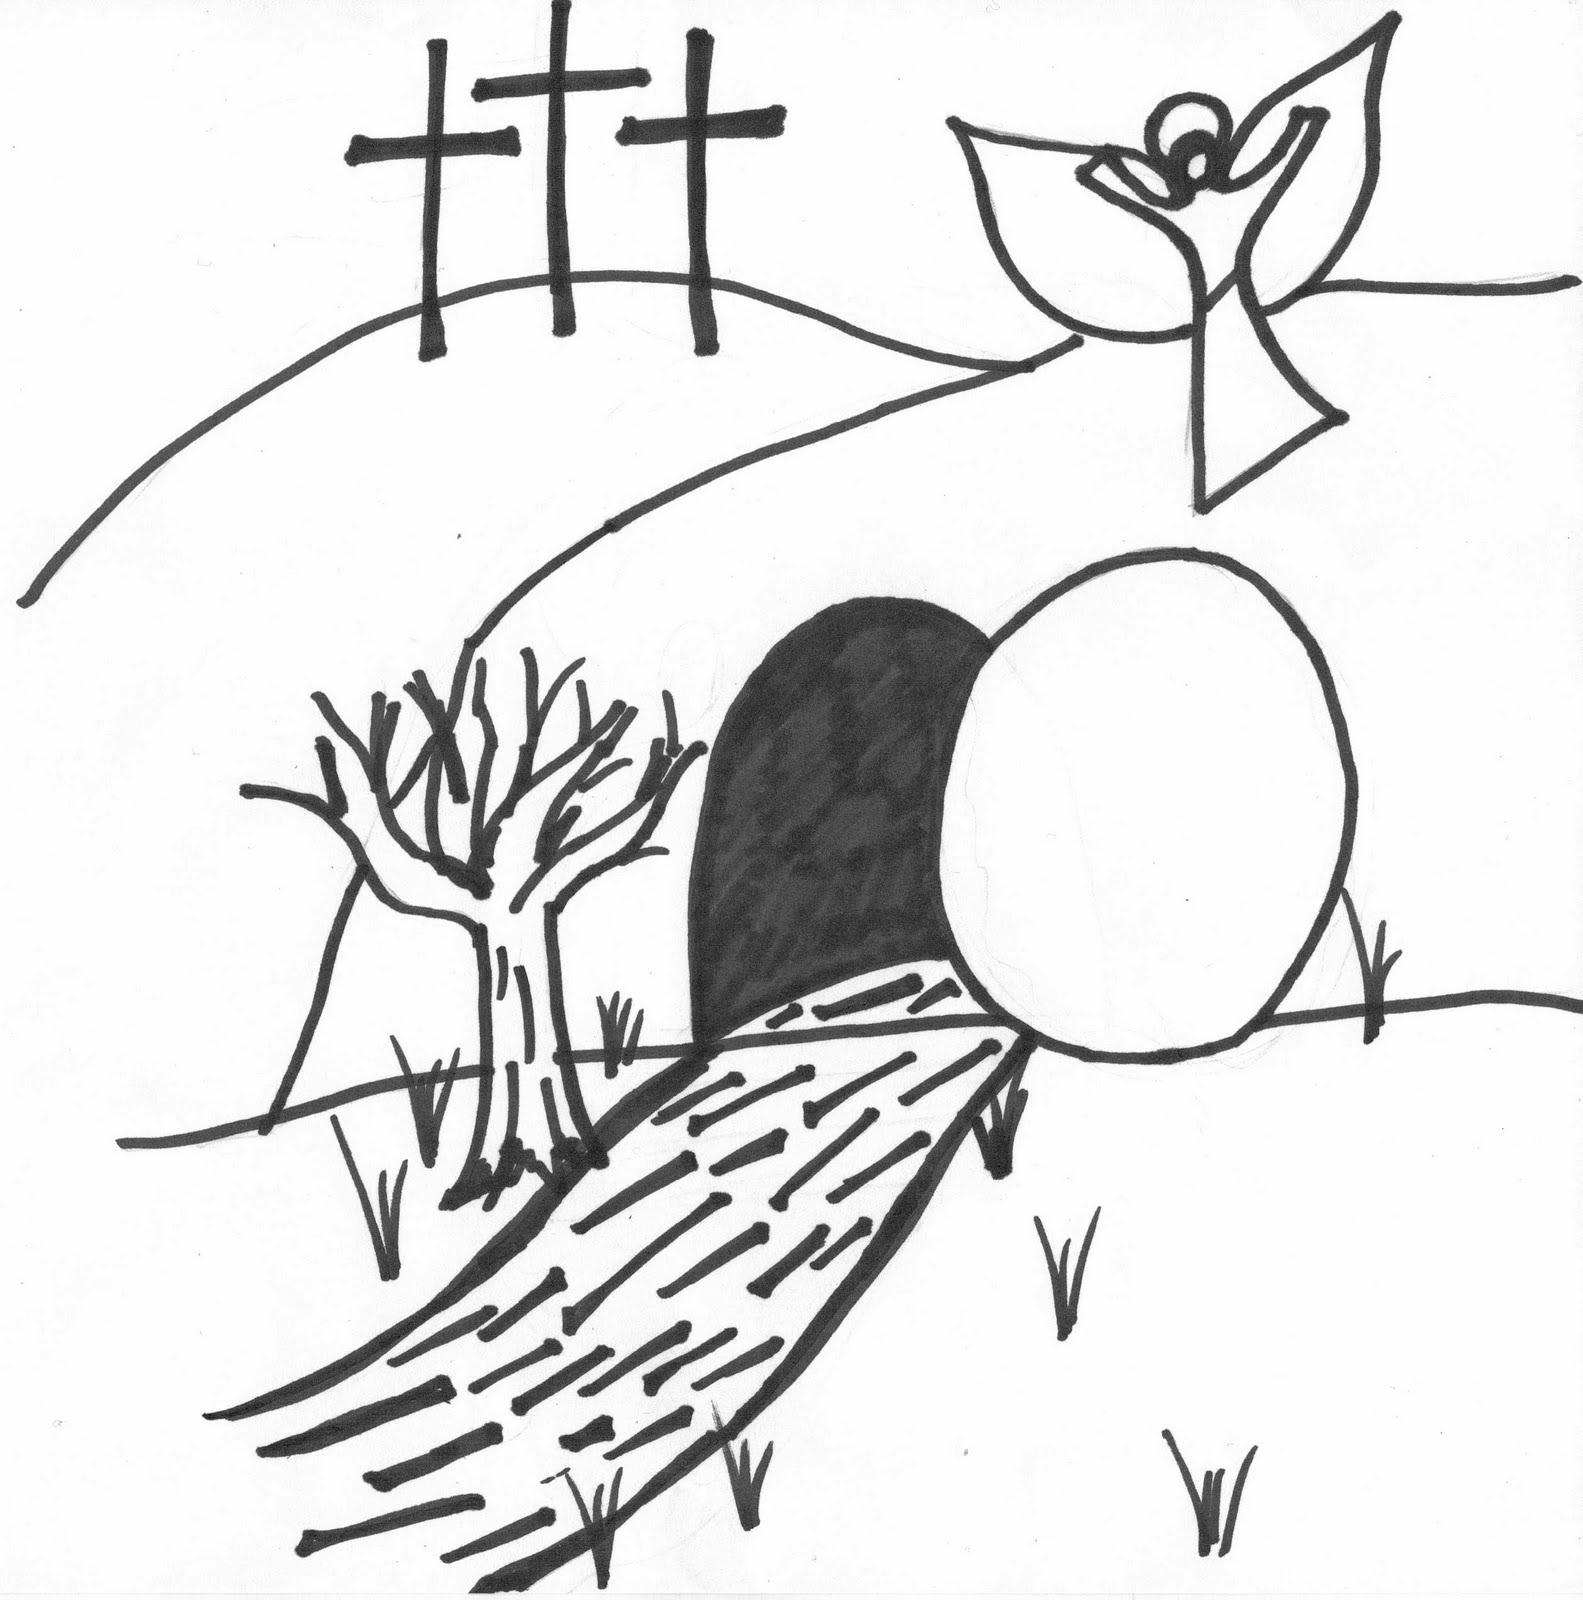 Jesus empty tomb coloring page sketch coloring page for Jesus empty tomb coloring pages